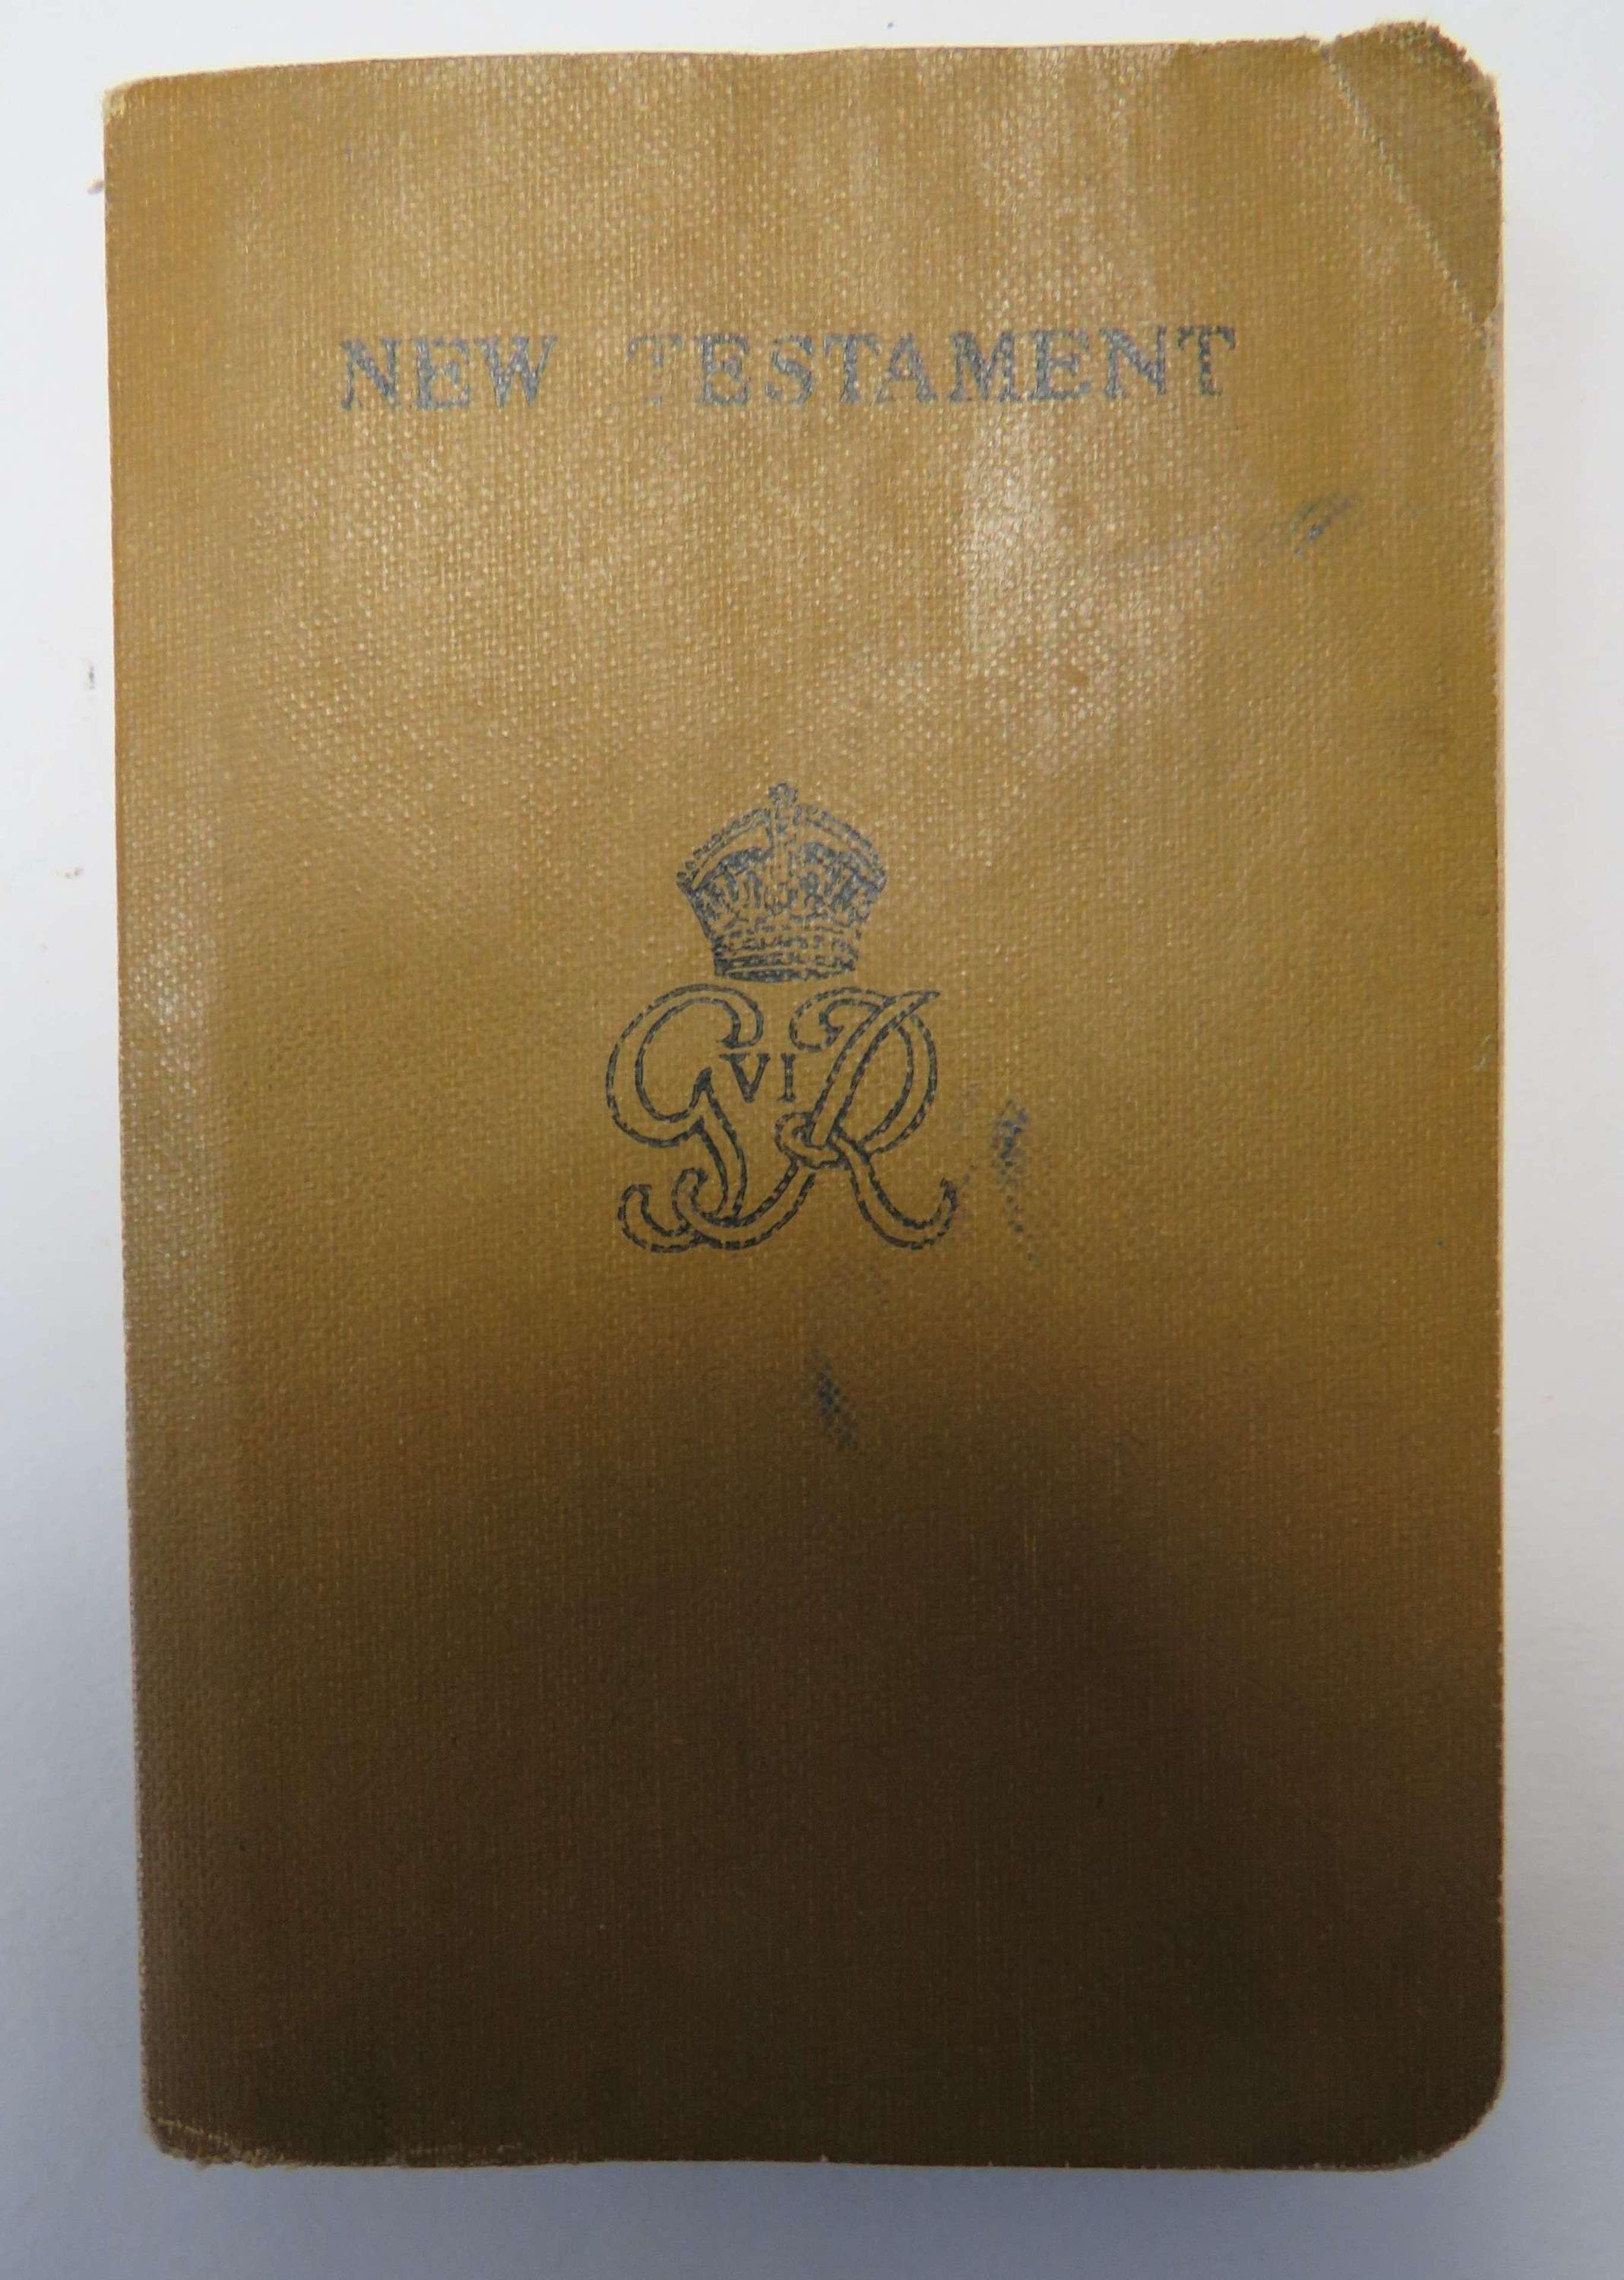 WW2 Issue New Testament Bible